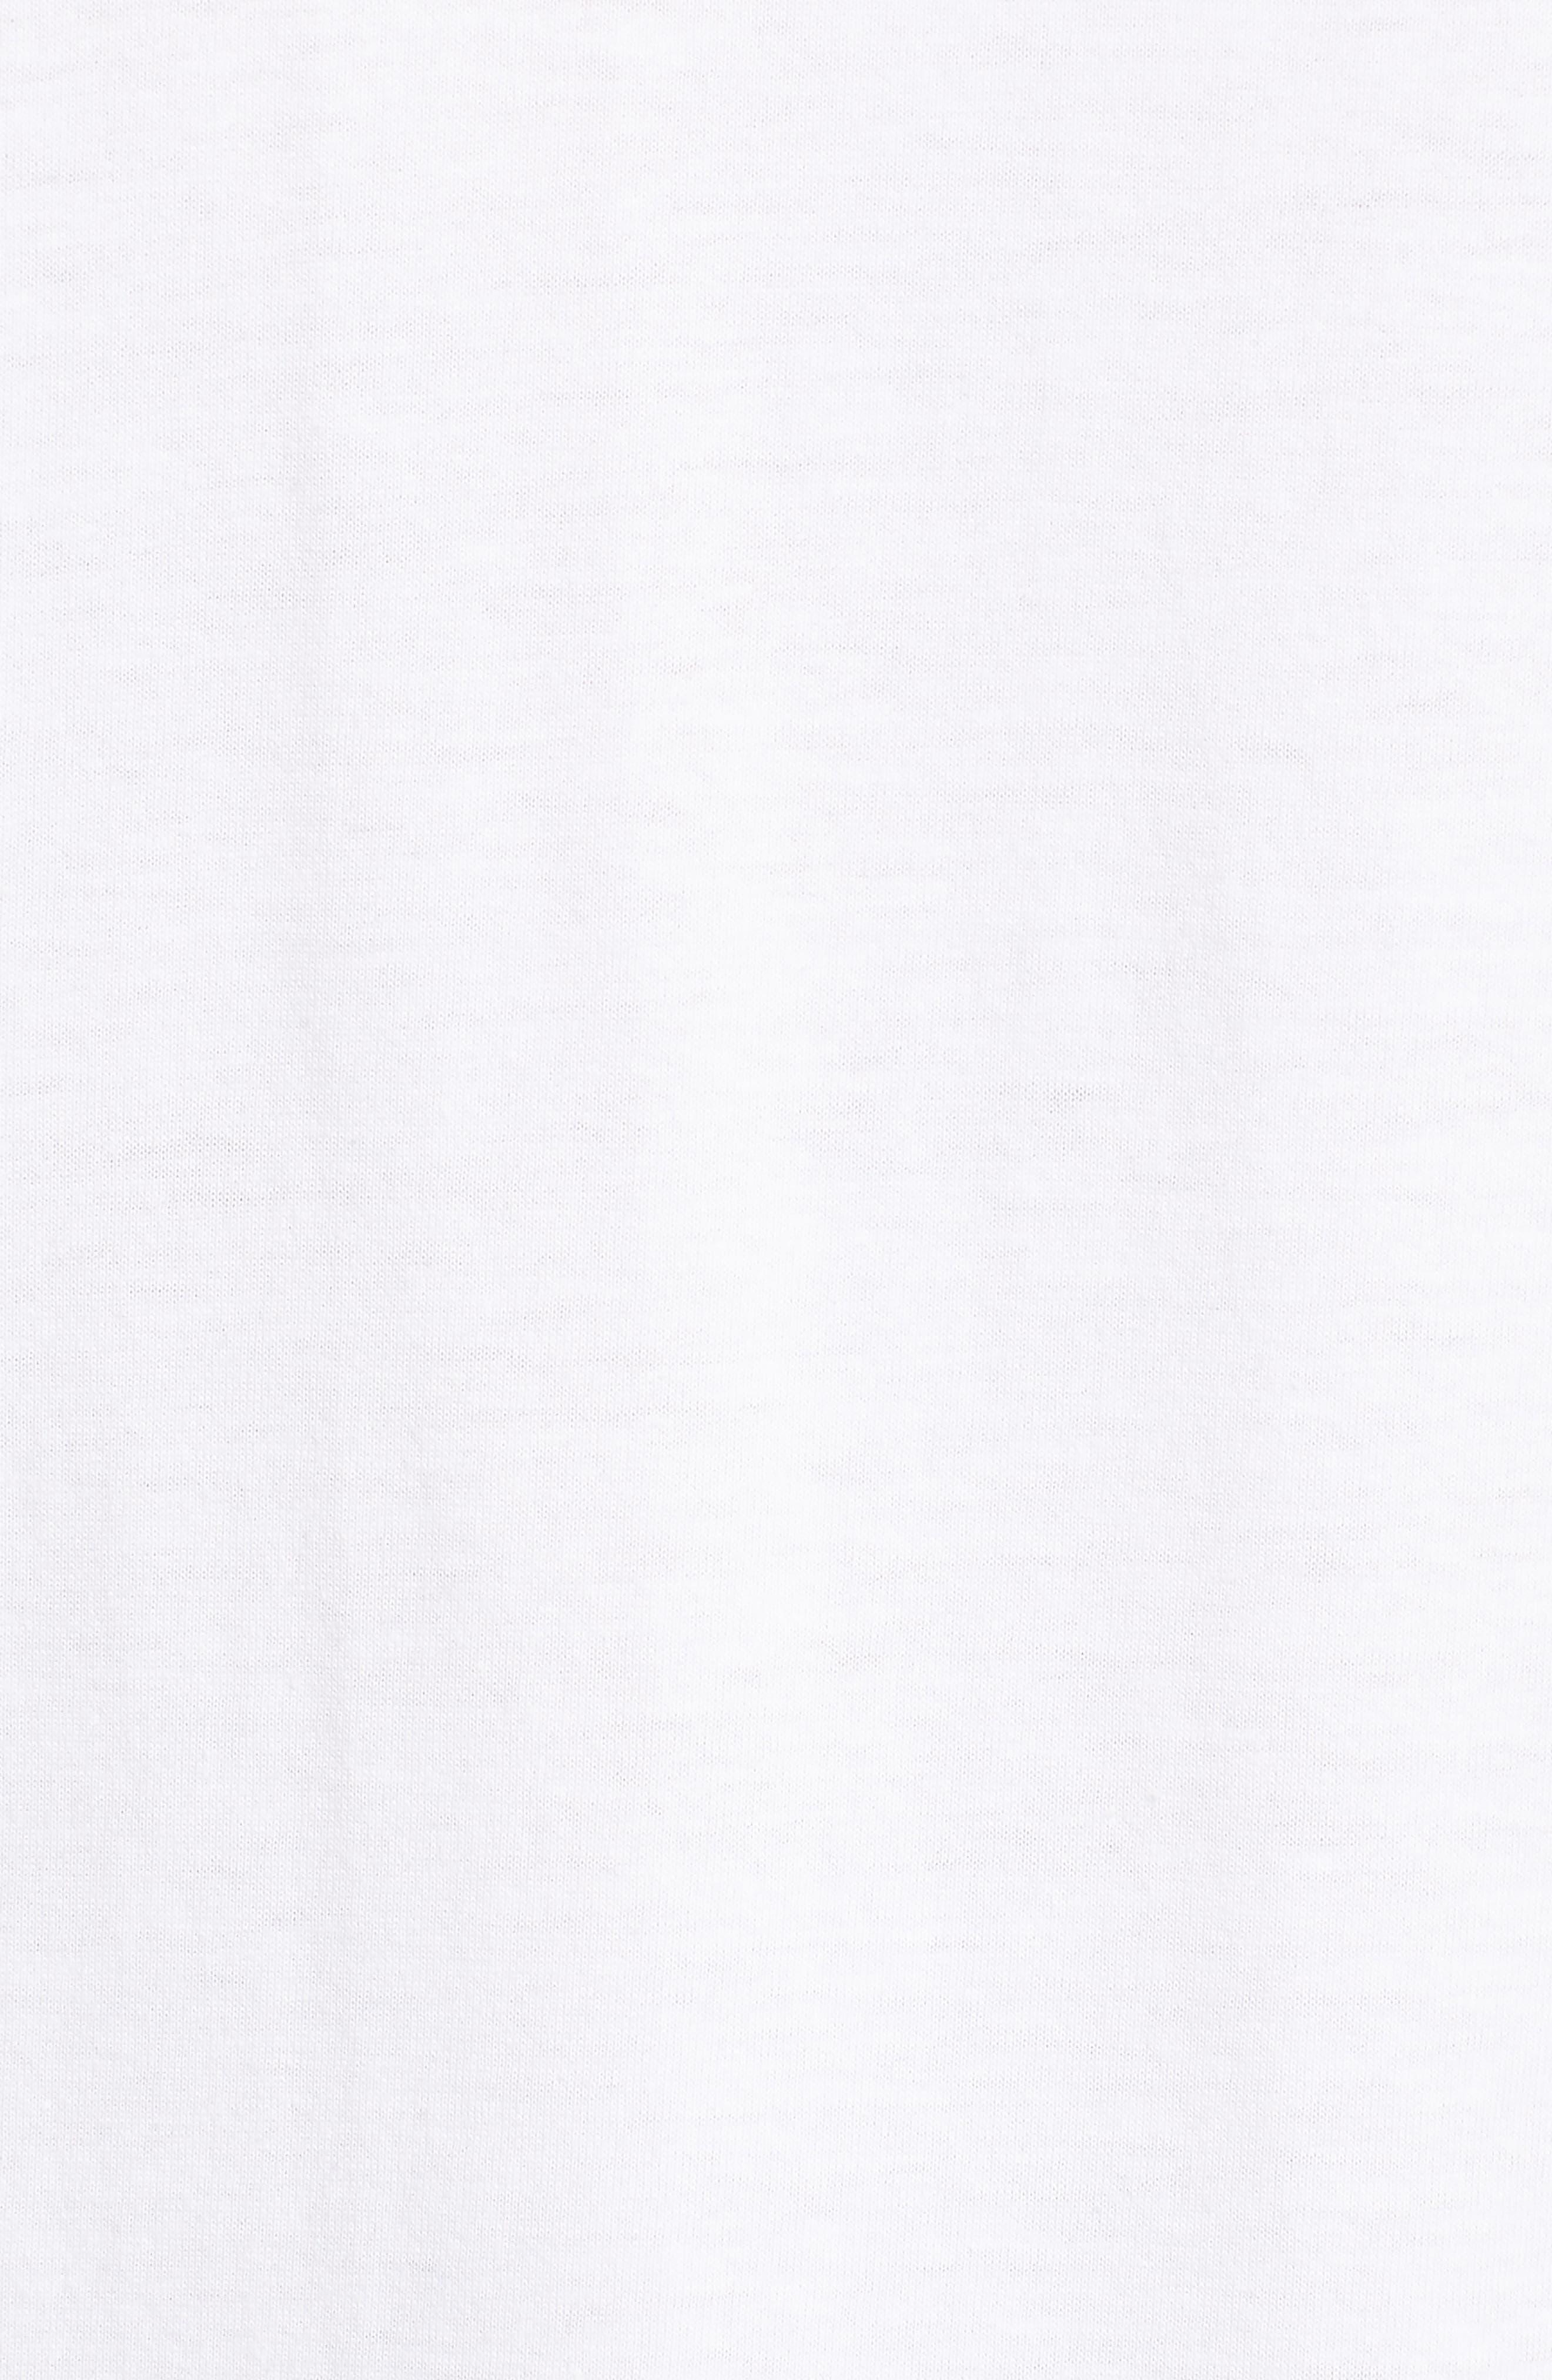 Slim Fit Long Sleeve Raglan T-Shirt,                             Alternate thumbnail 5, color,                             White/ Marine